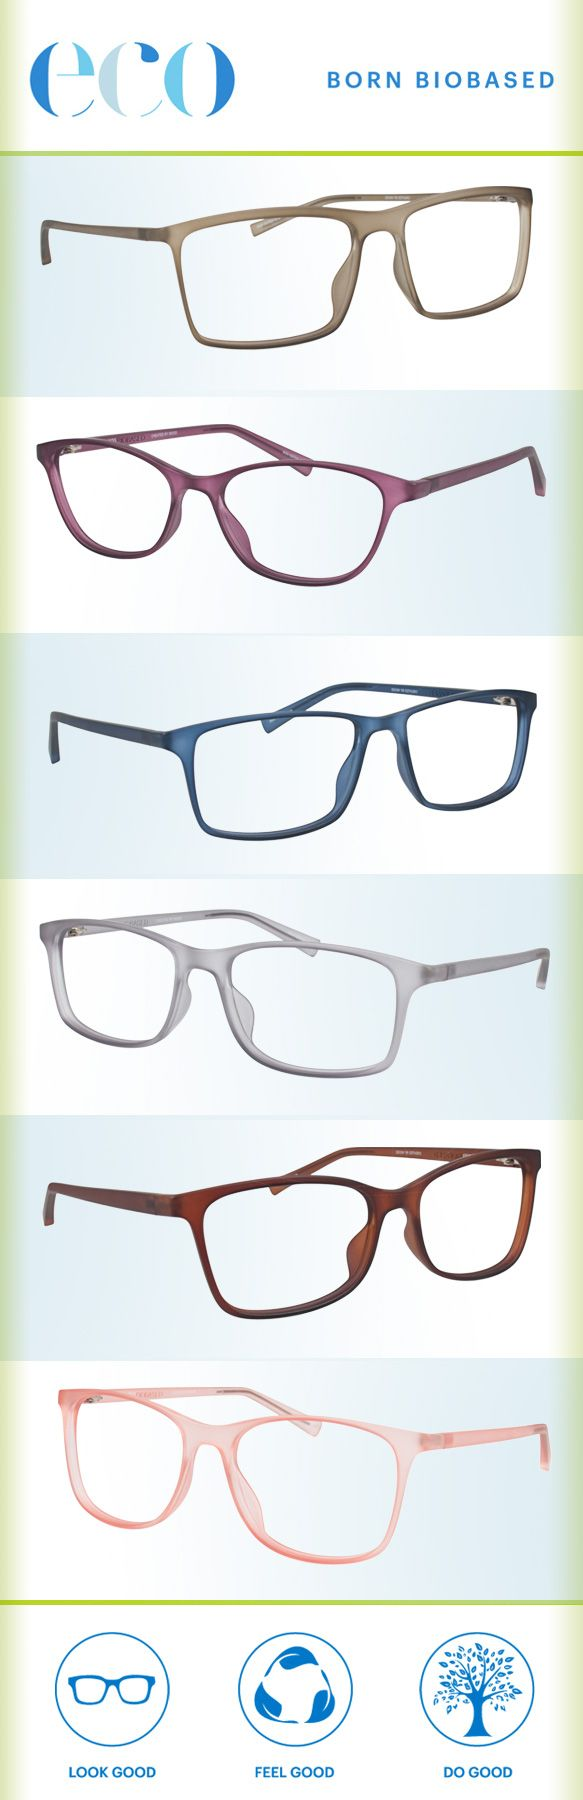 25 best Made In USA Eyewear images on Pinterest | Sunglasses, Eye ...